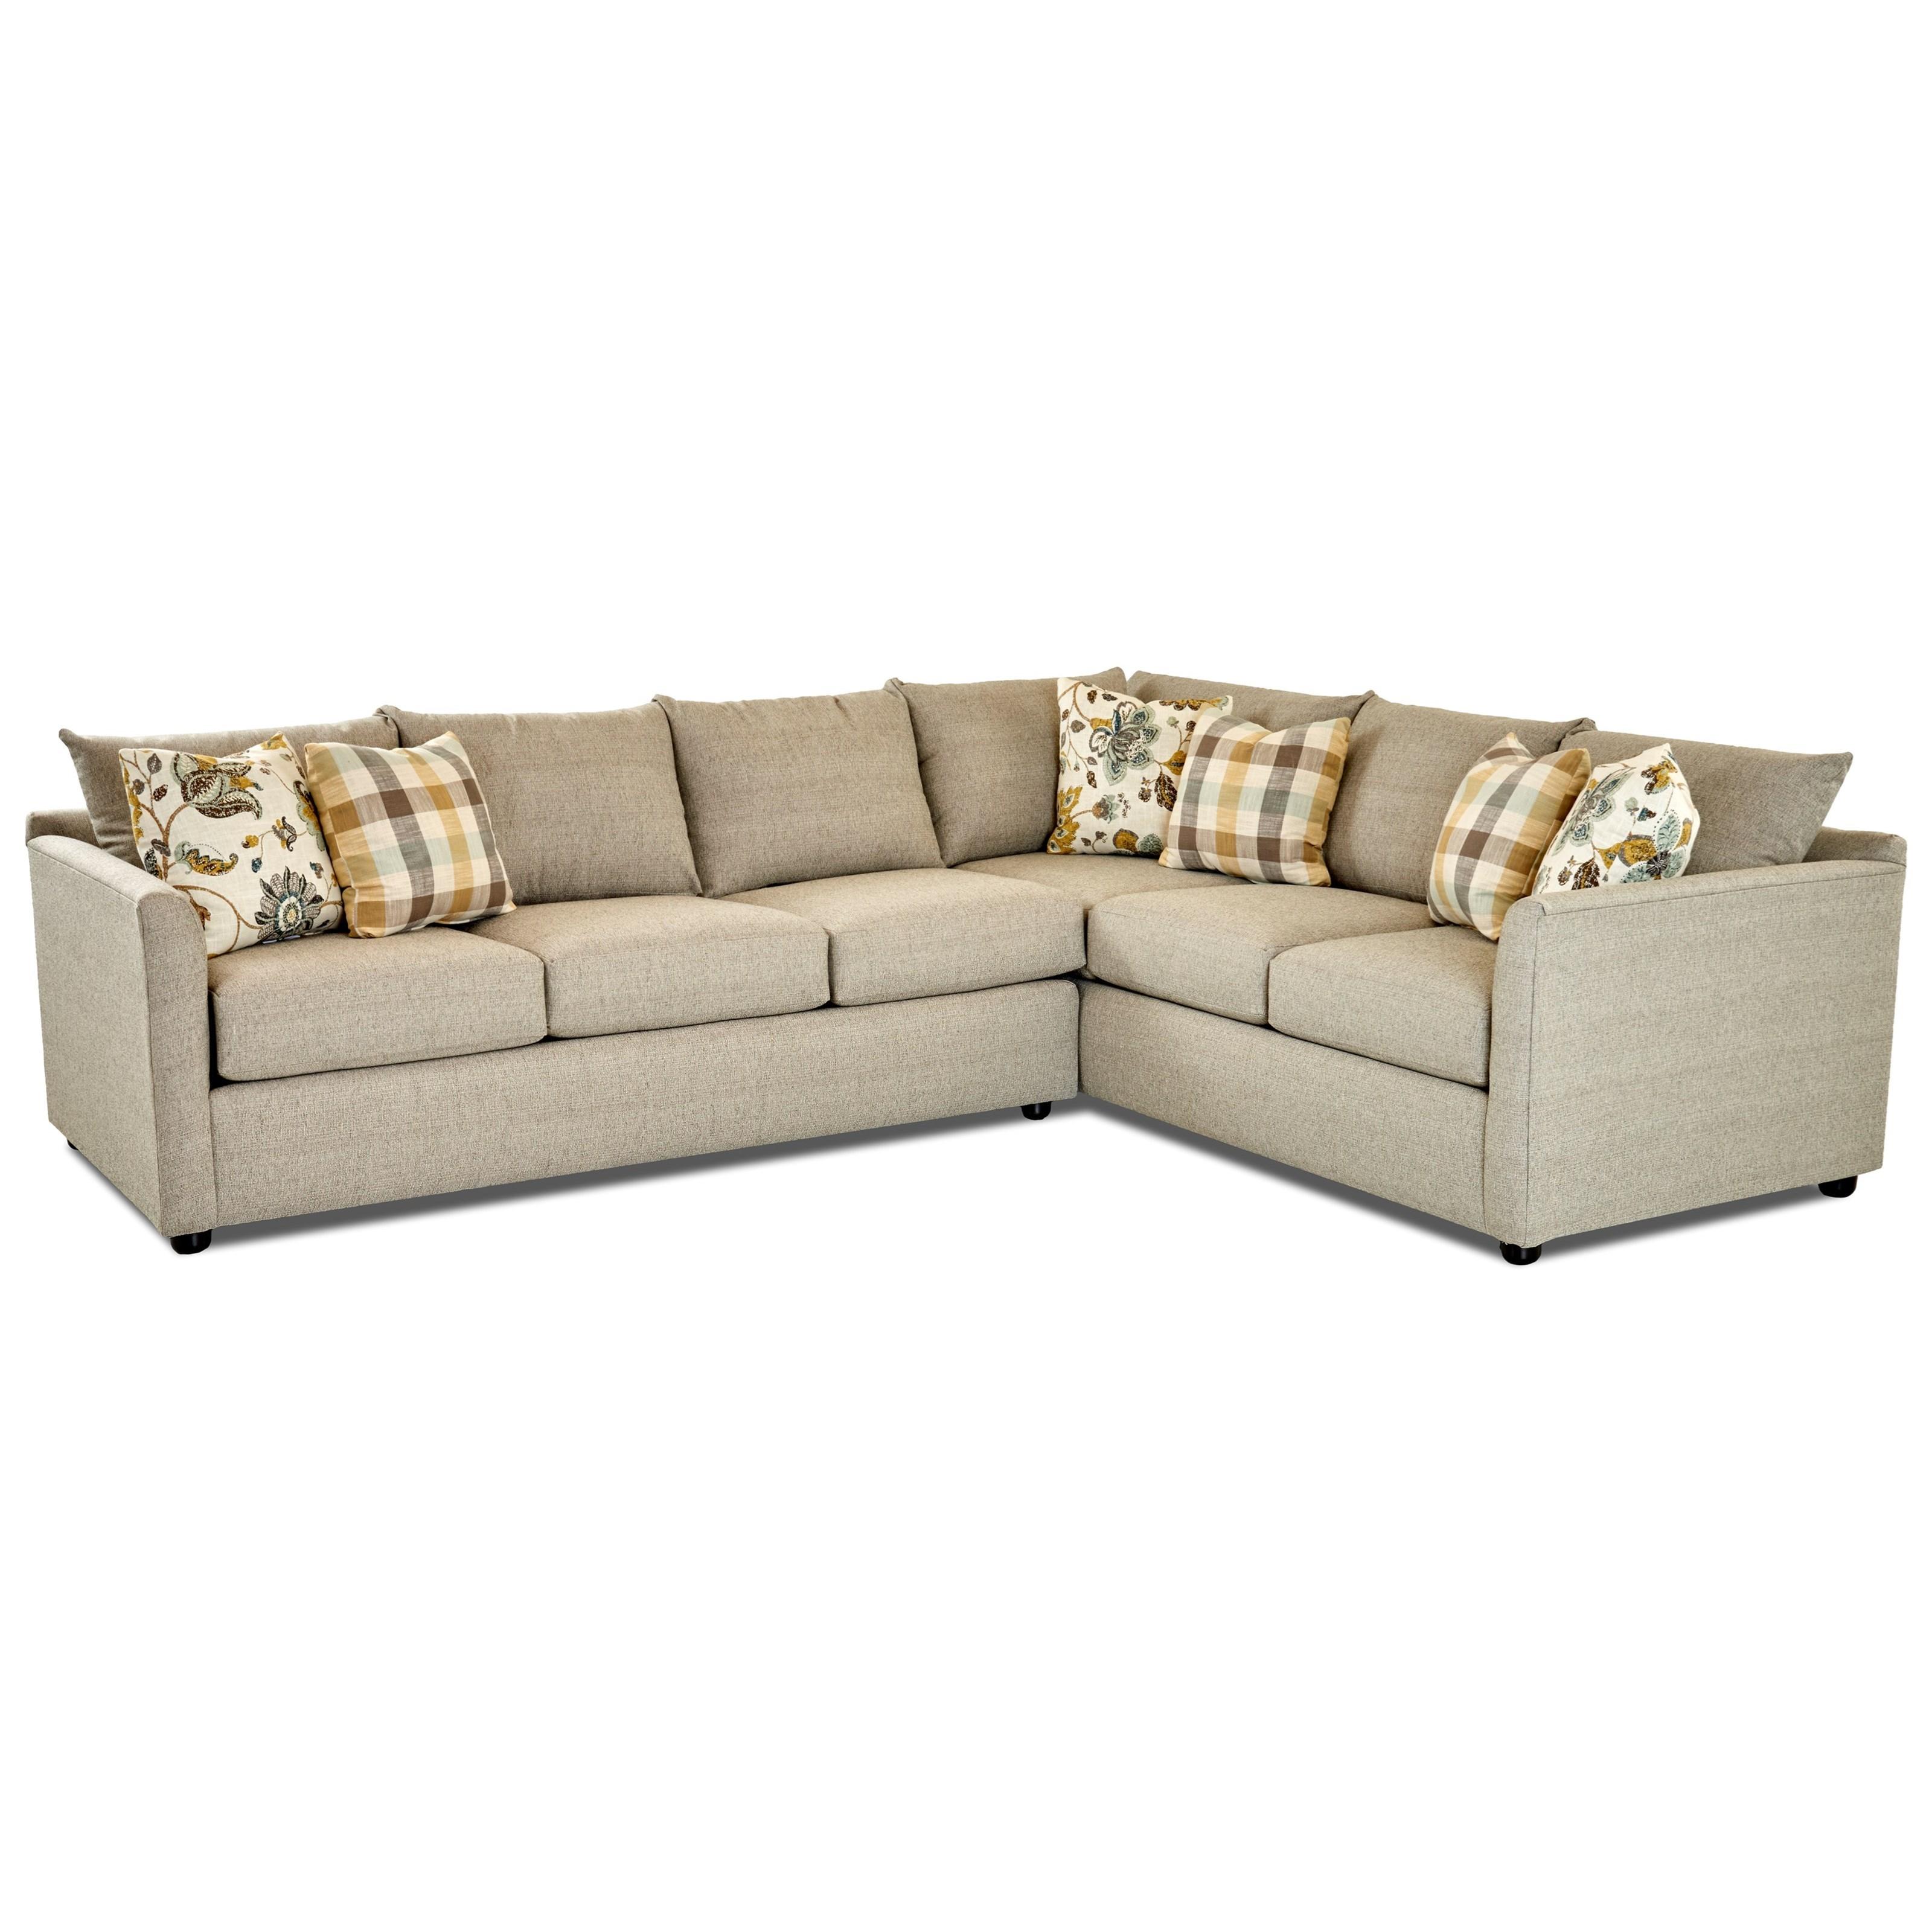 Atlanta Sectional Sofa by Klaussner at H.L. Stephens